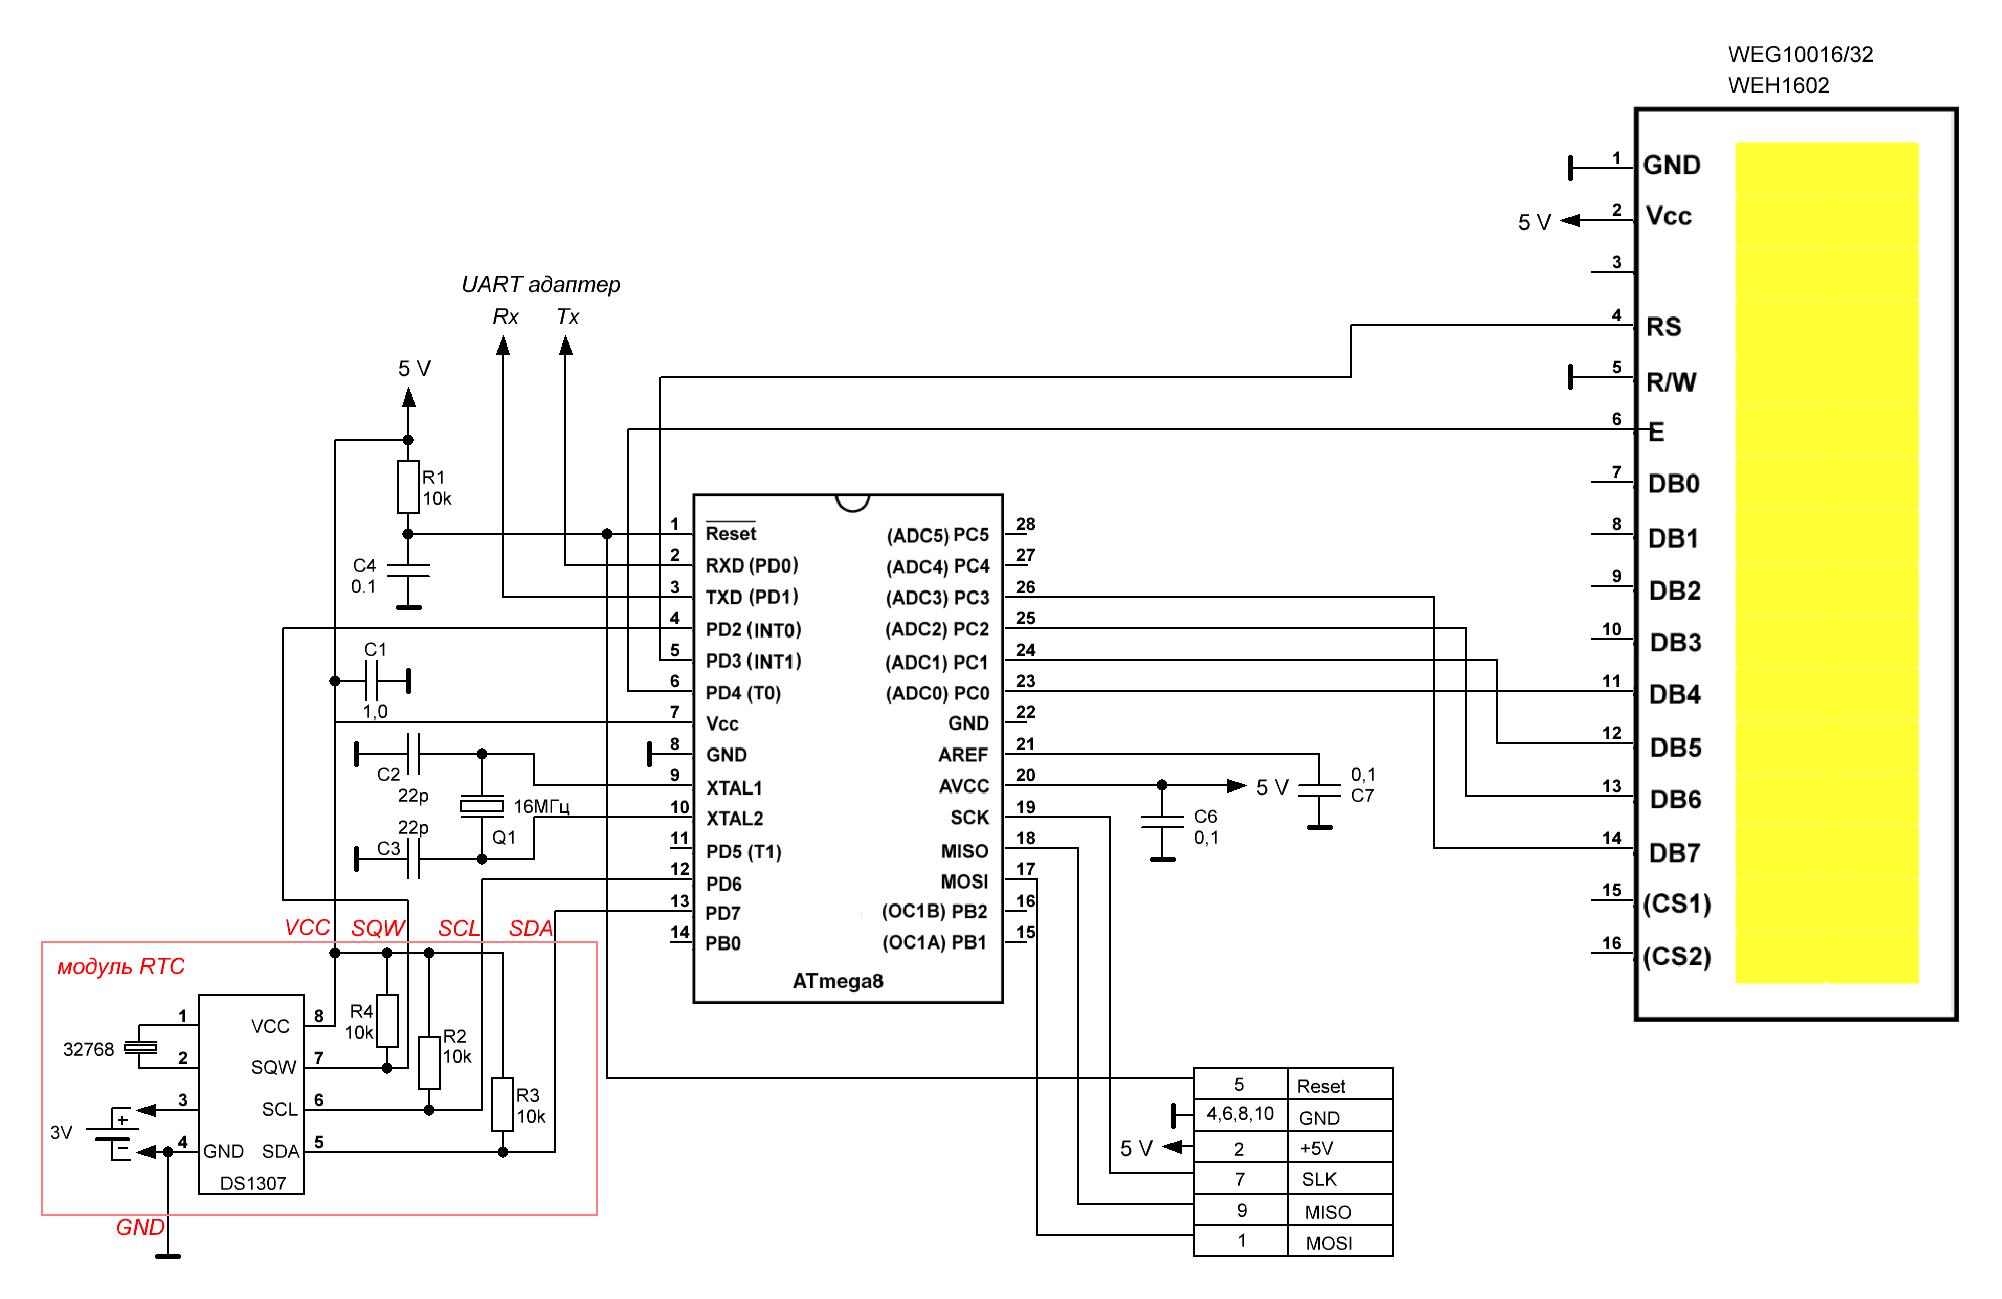 Управление LCD и OLED дисплеями на AVR-ассемблере - 5